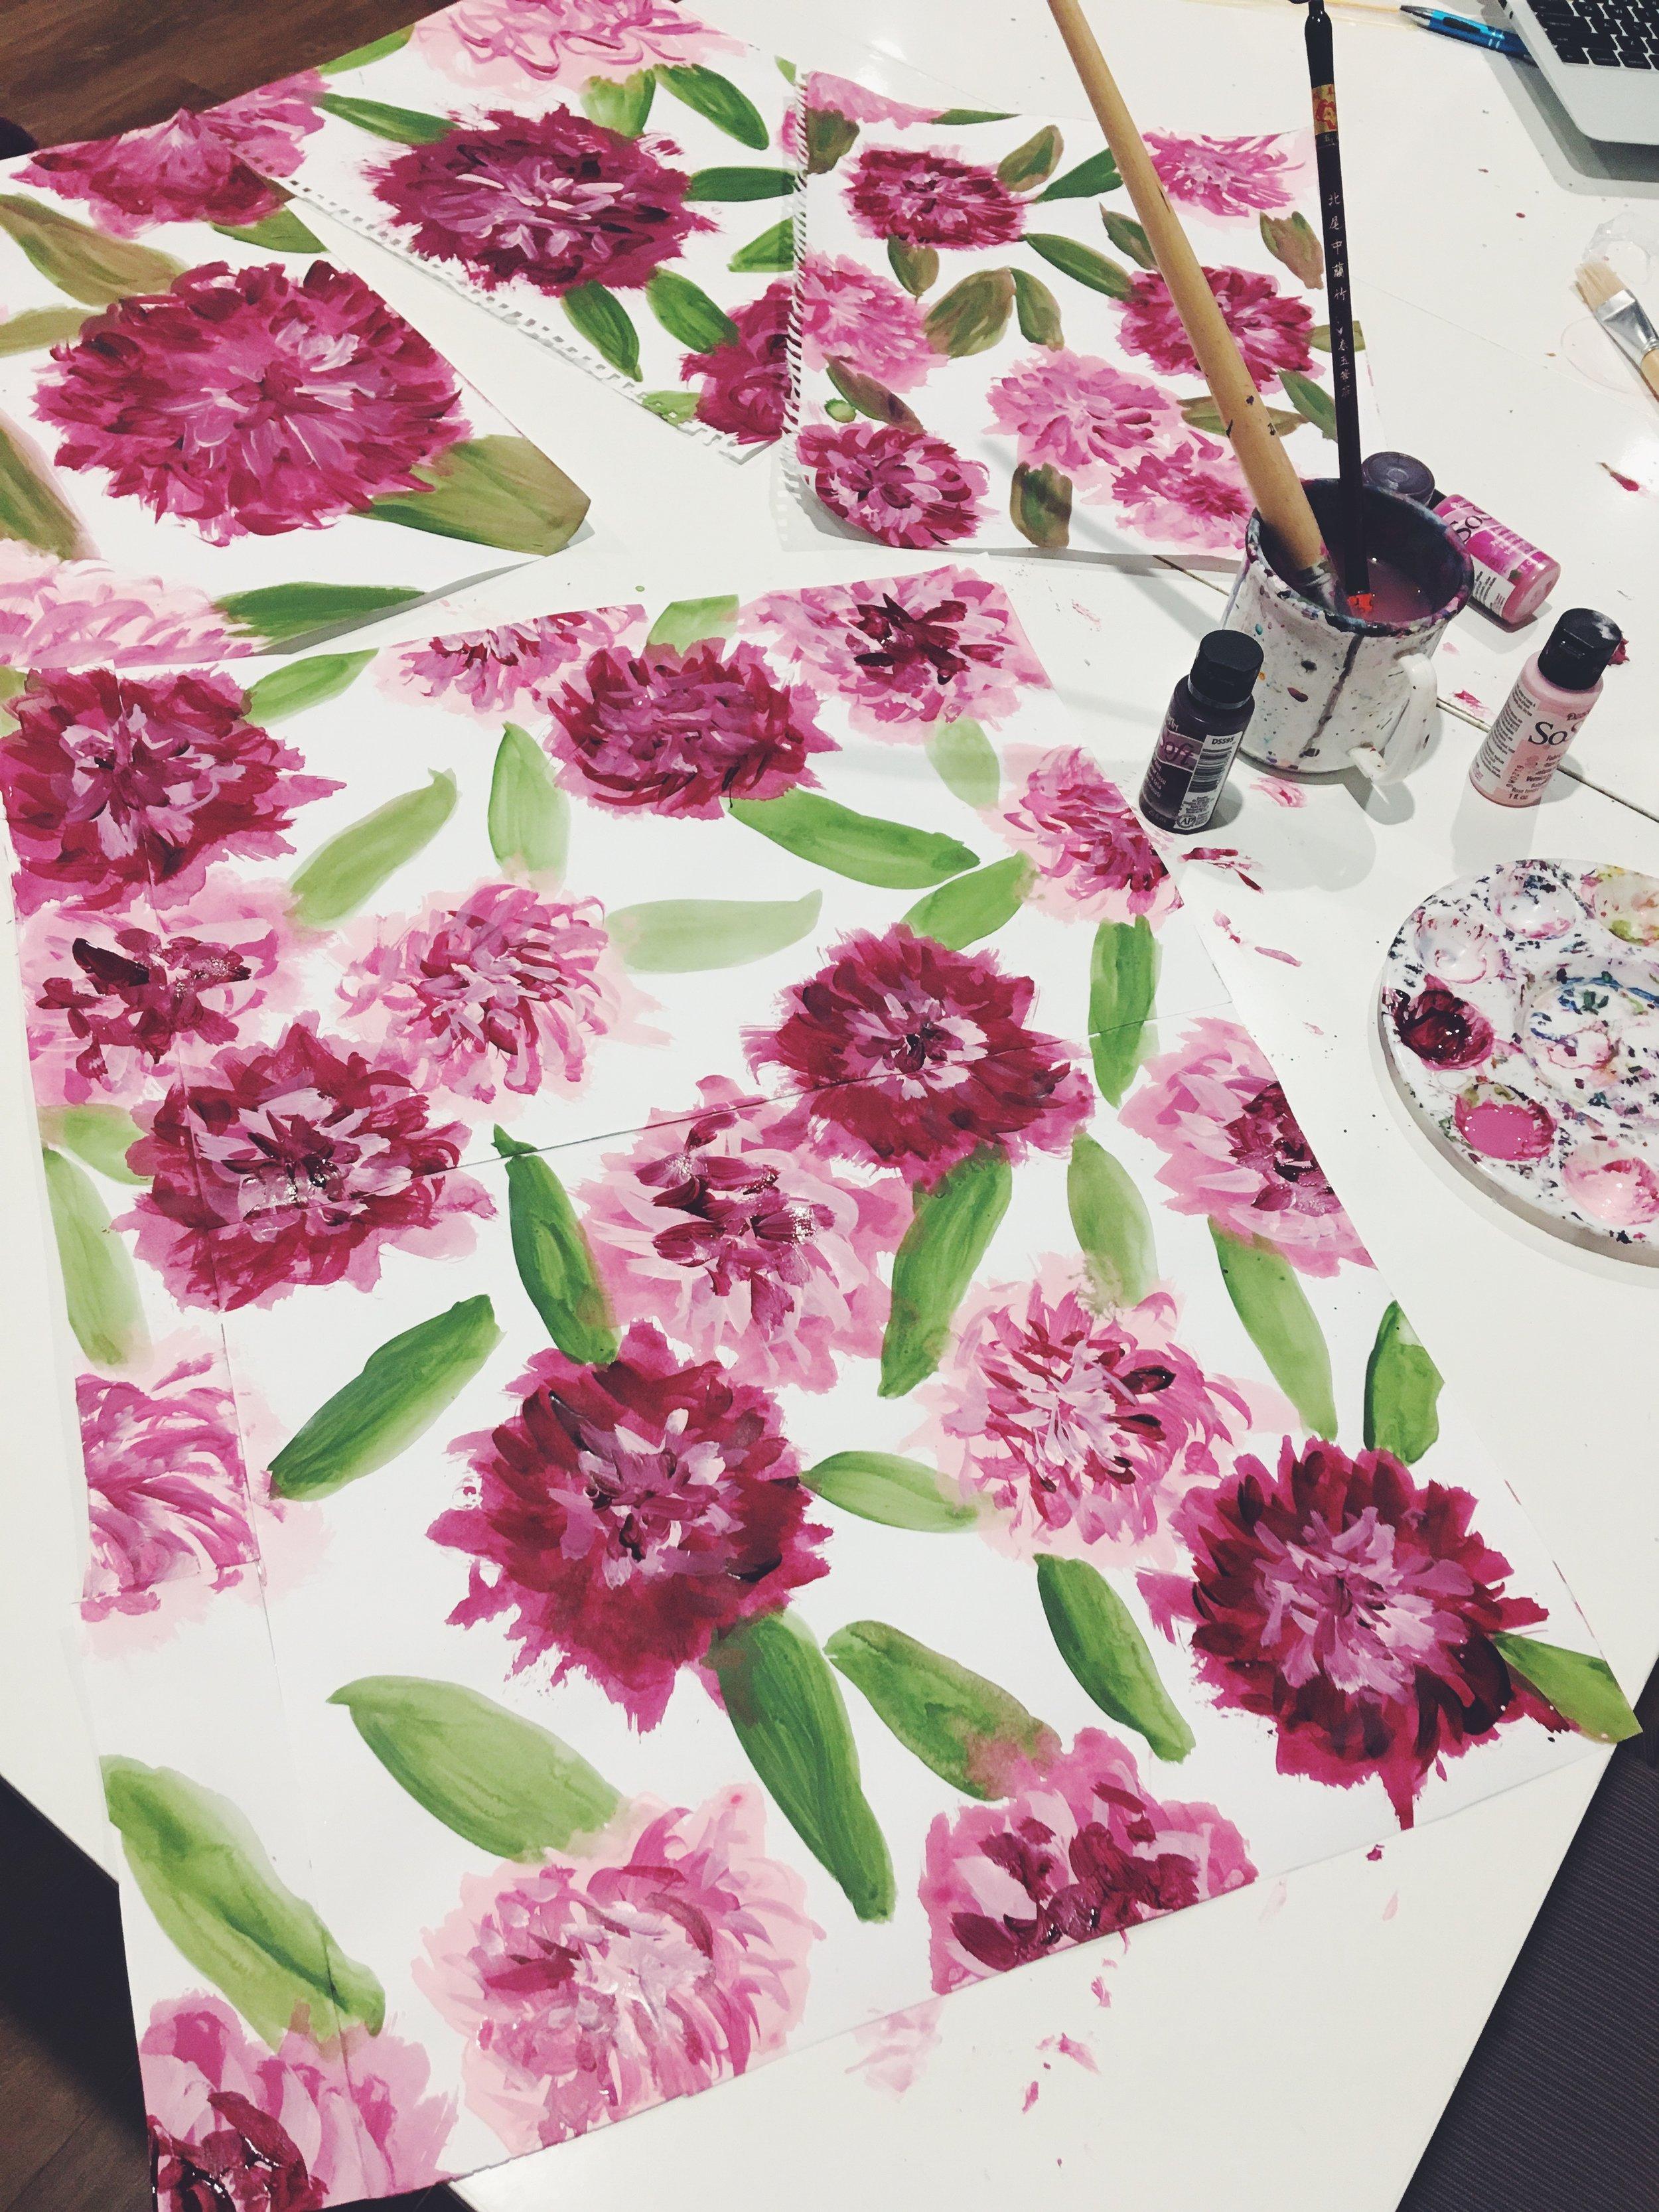 edward kwan hand painted floral bow ties melbourne australia 9.JPG